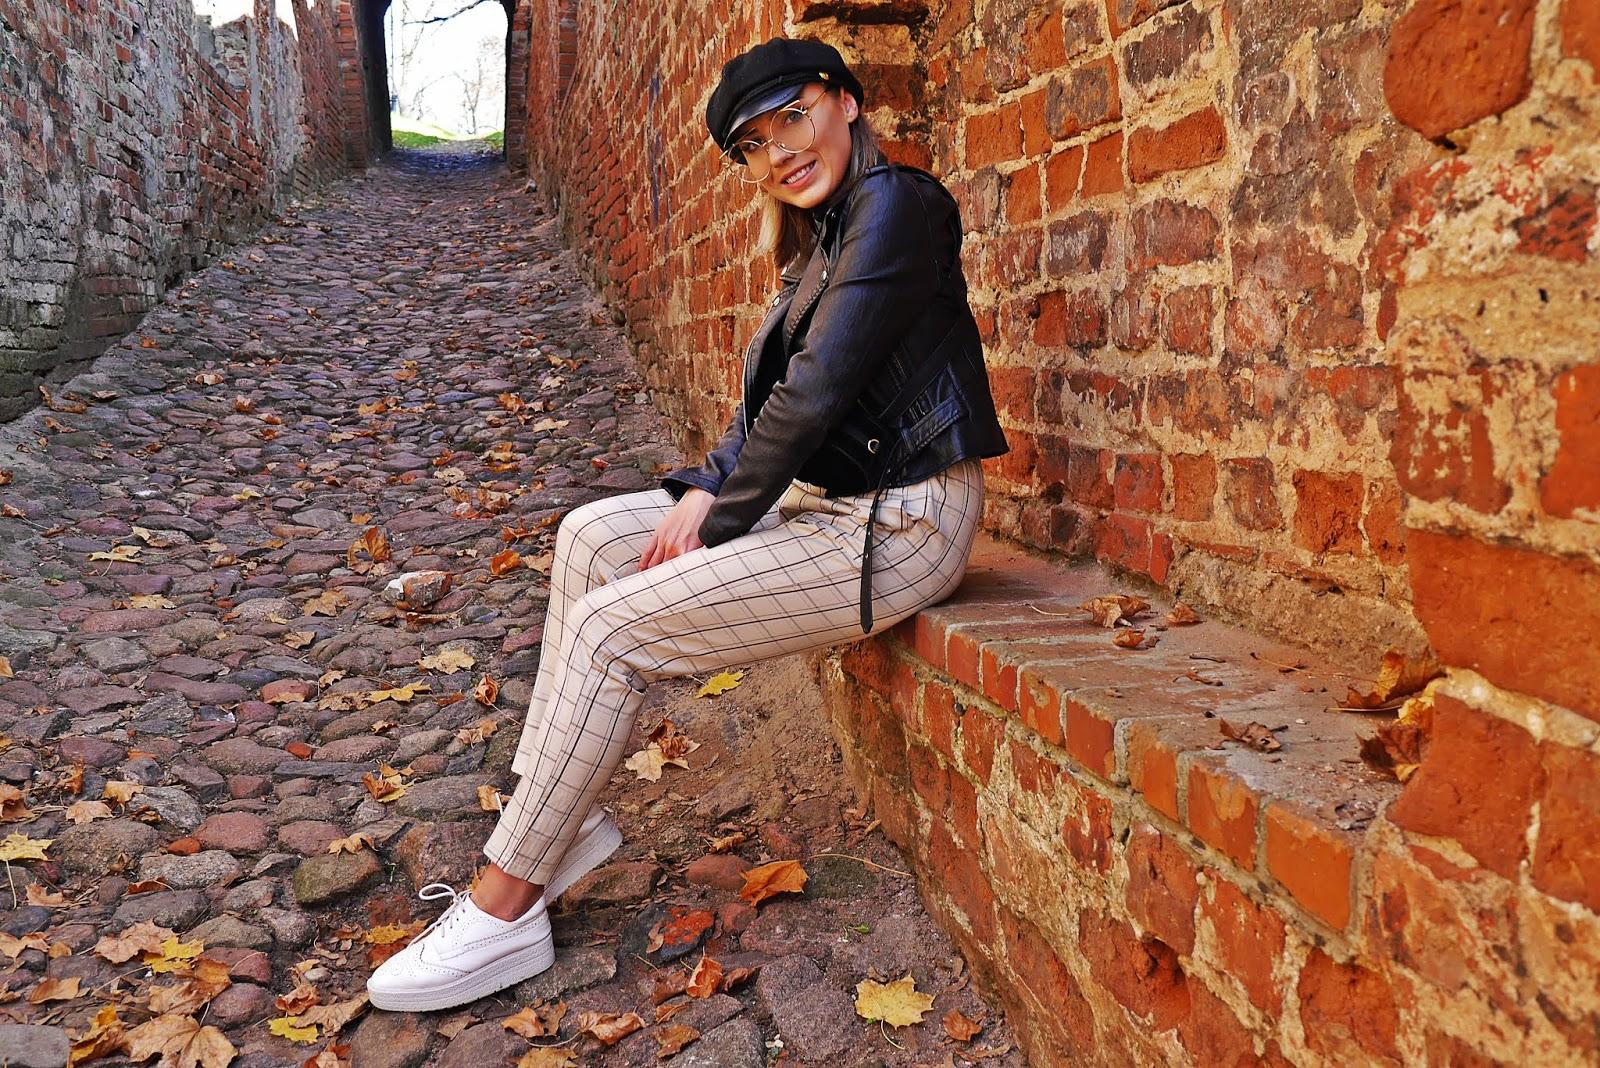 plaid pants turtle neck sweater biker jacket outfit karyn modowe stylizacje blog modowy damski blogerka modowa